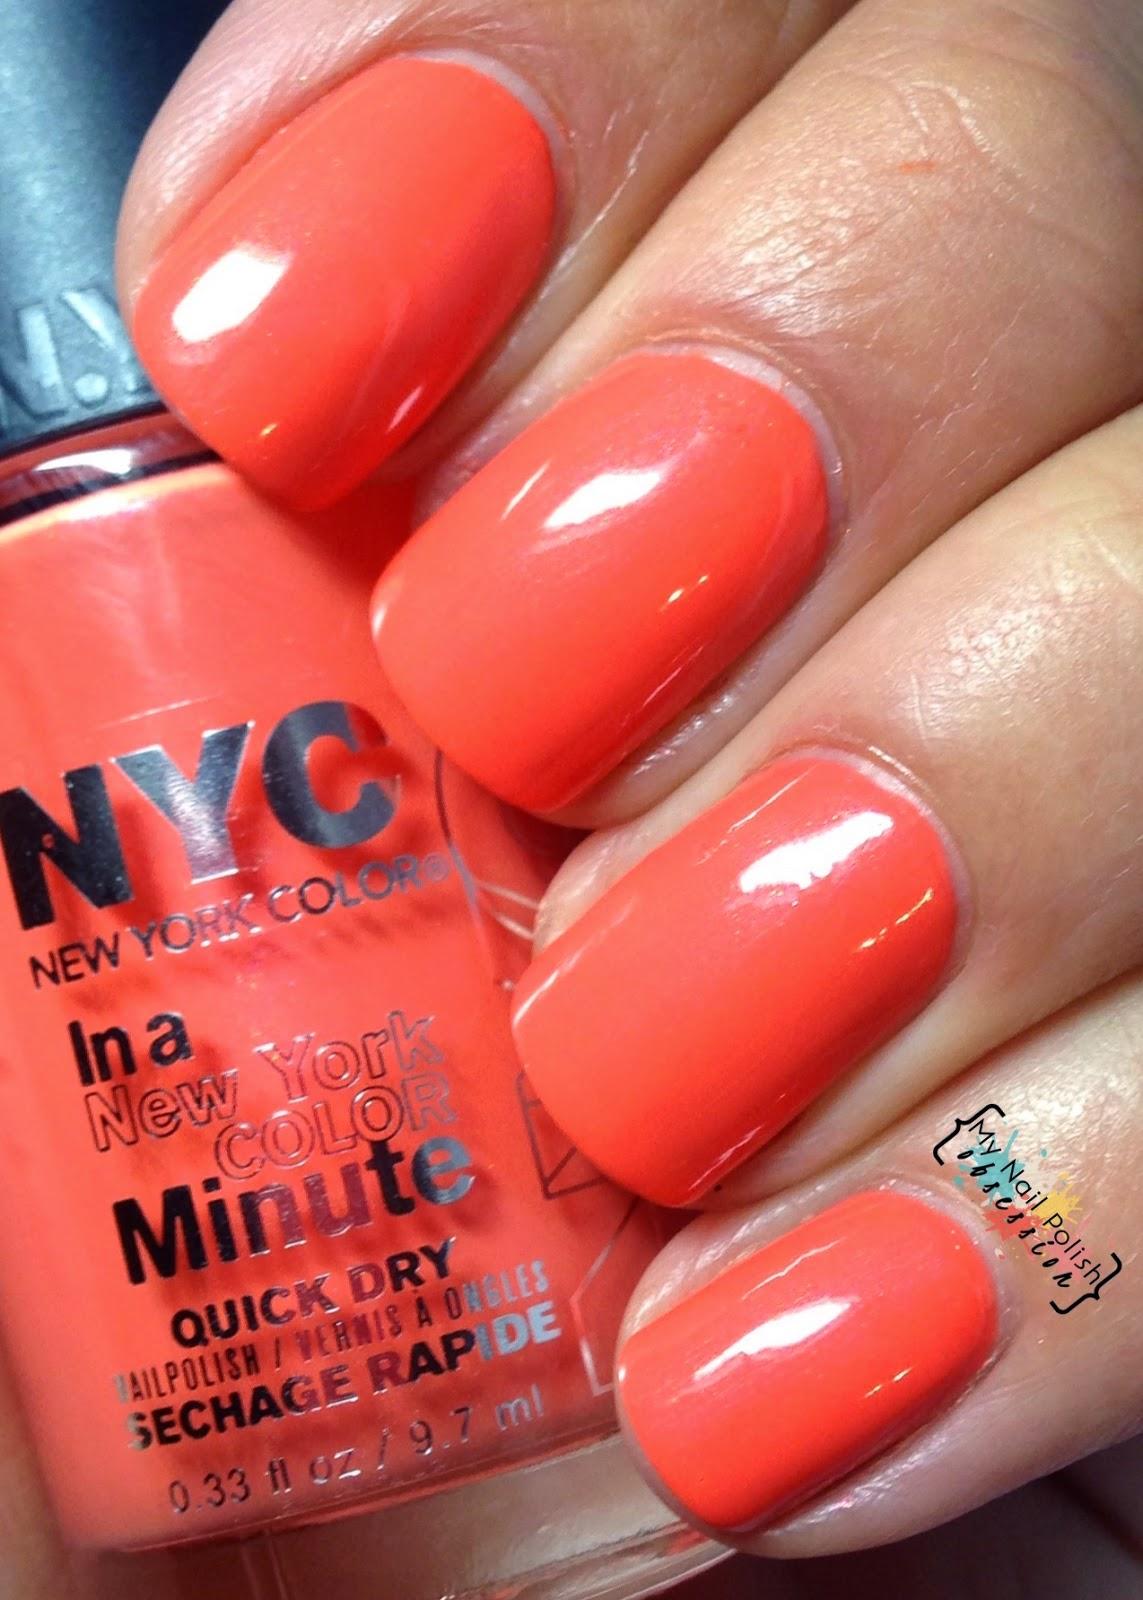 NYC New York Color Animal Instinct